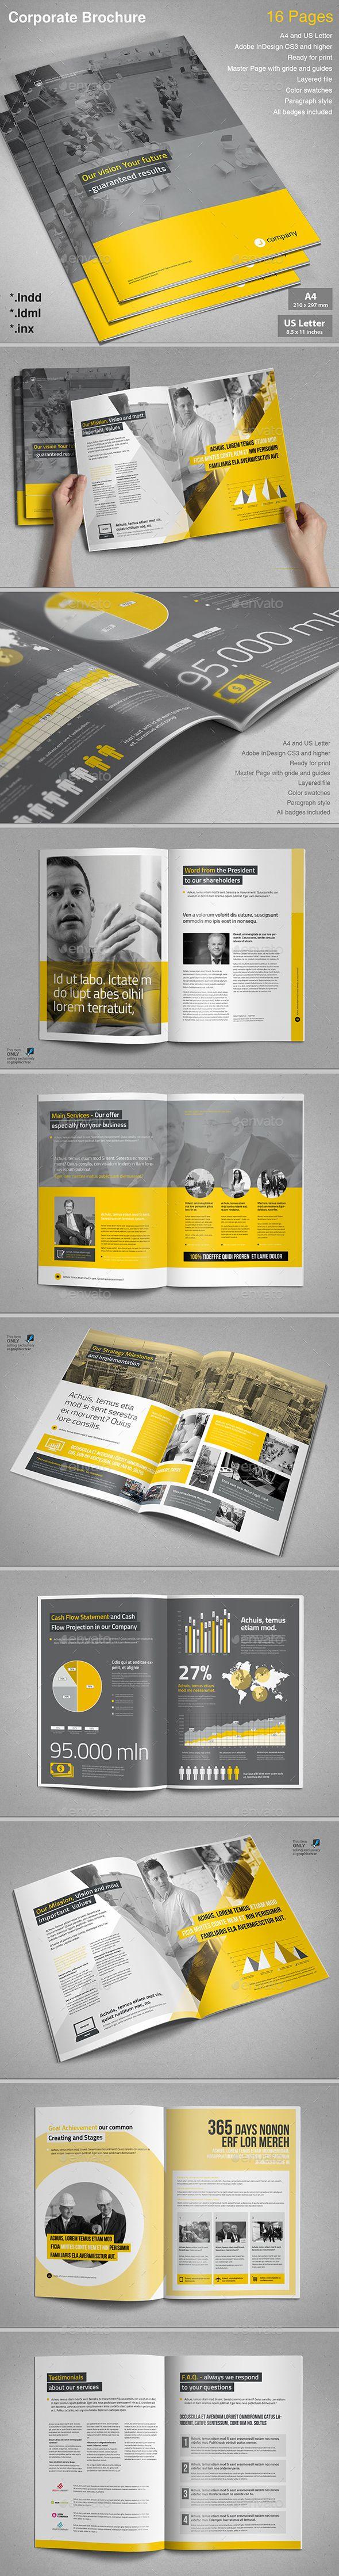 Corporate Brochure Vol.5 InDesign Template • Download ➝ https://graphicriver.net/item/corporate-brochure-vol5/14761306?ref=pxcr